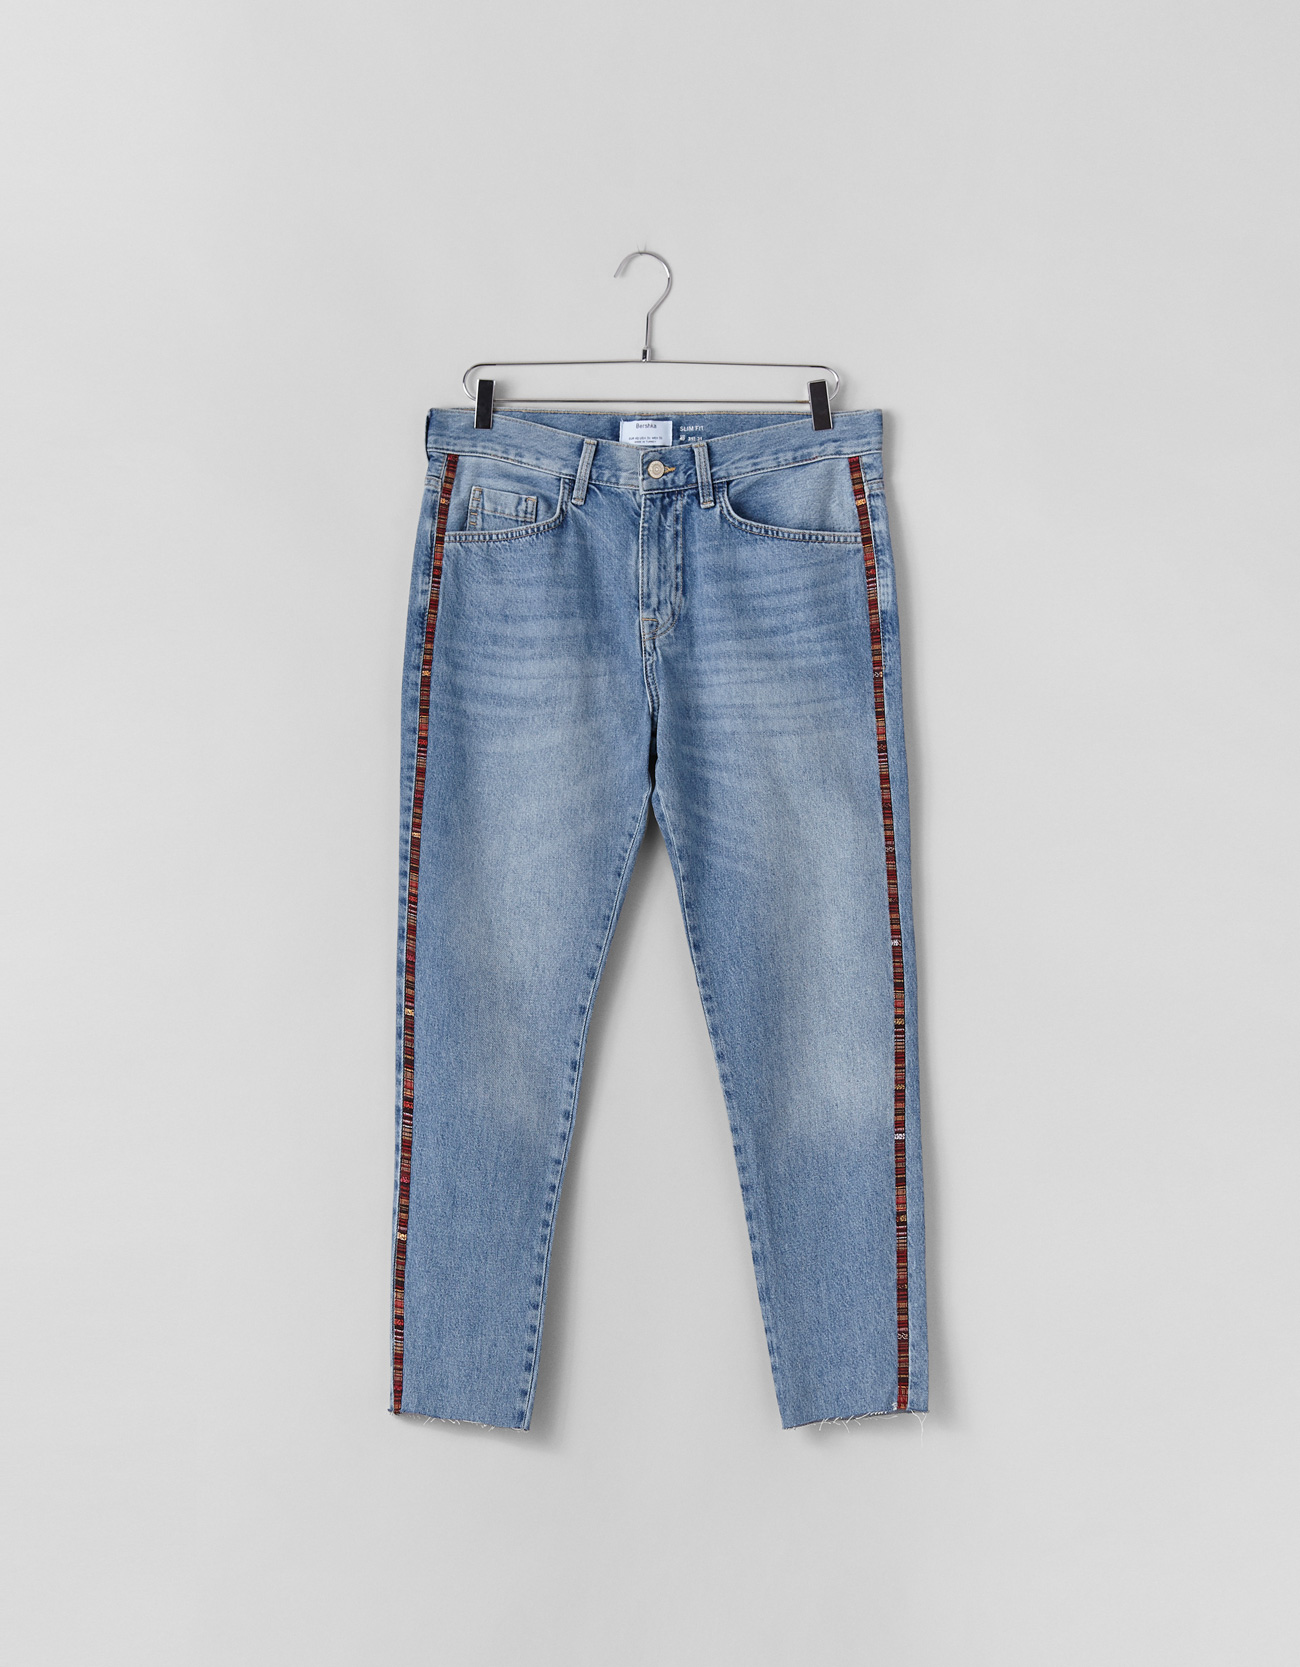 b449ac76fc9d4 Jeans Slim Fit con banda lateral - Jeans - Bershka Mexico